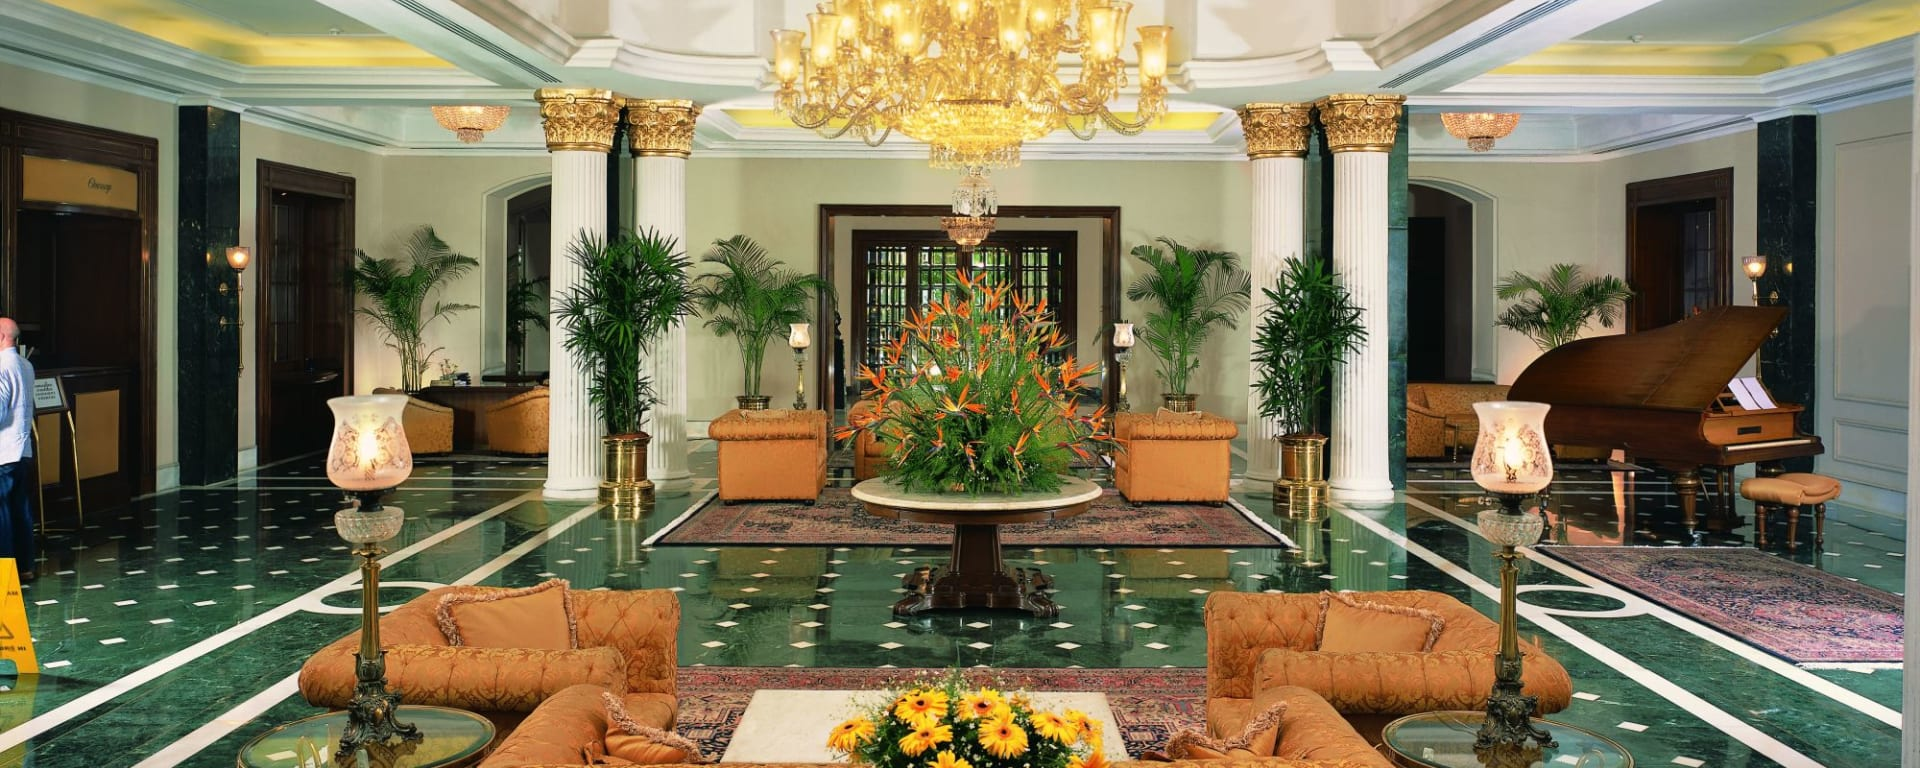 The Oberoi Grand à Kolkata: Grand Lobby